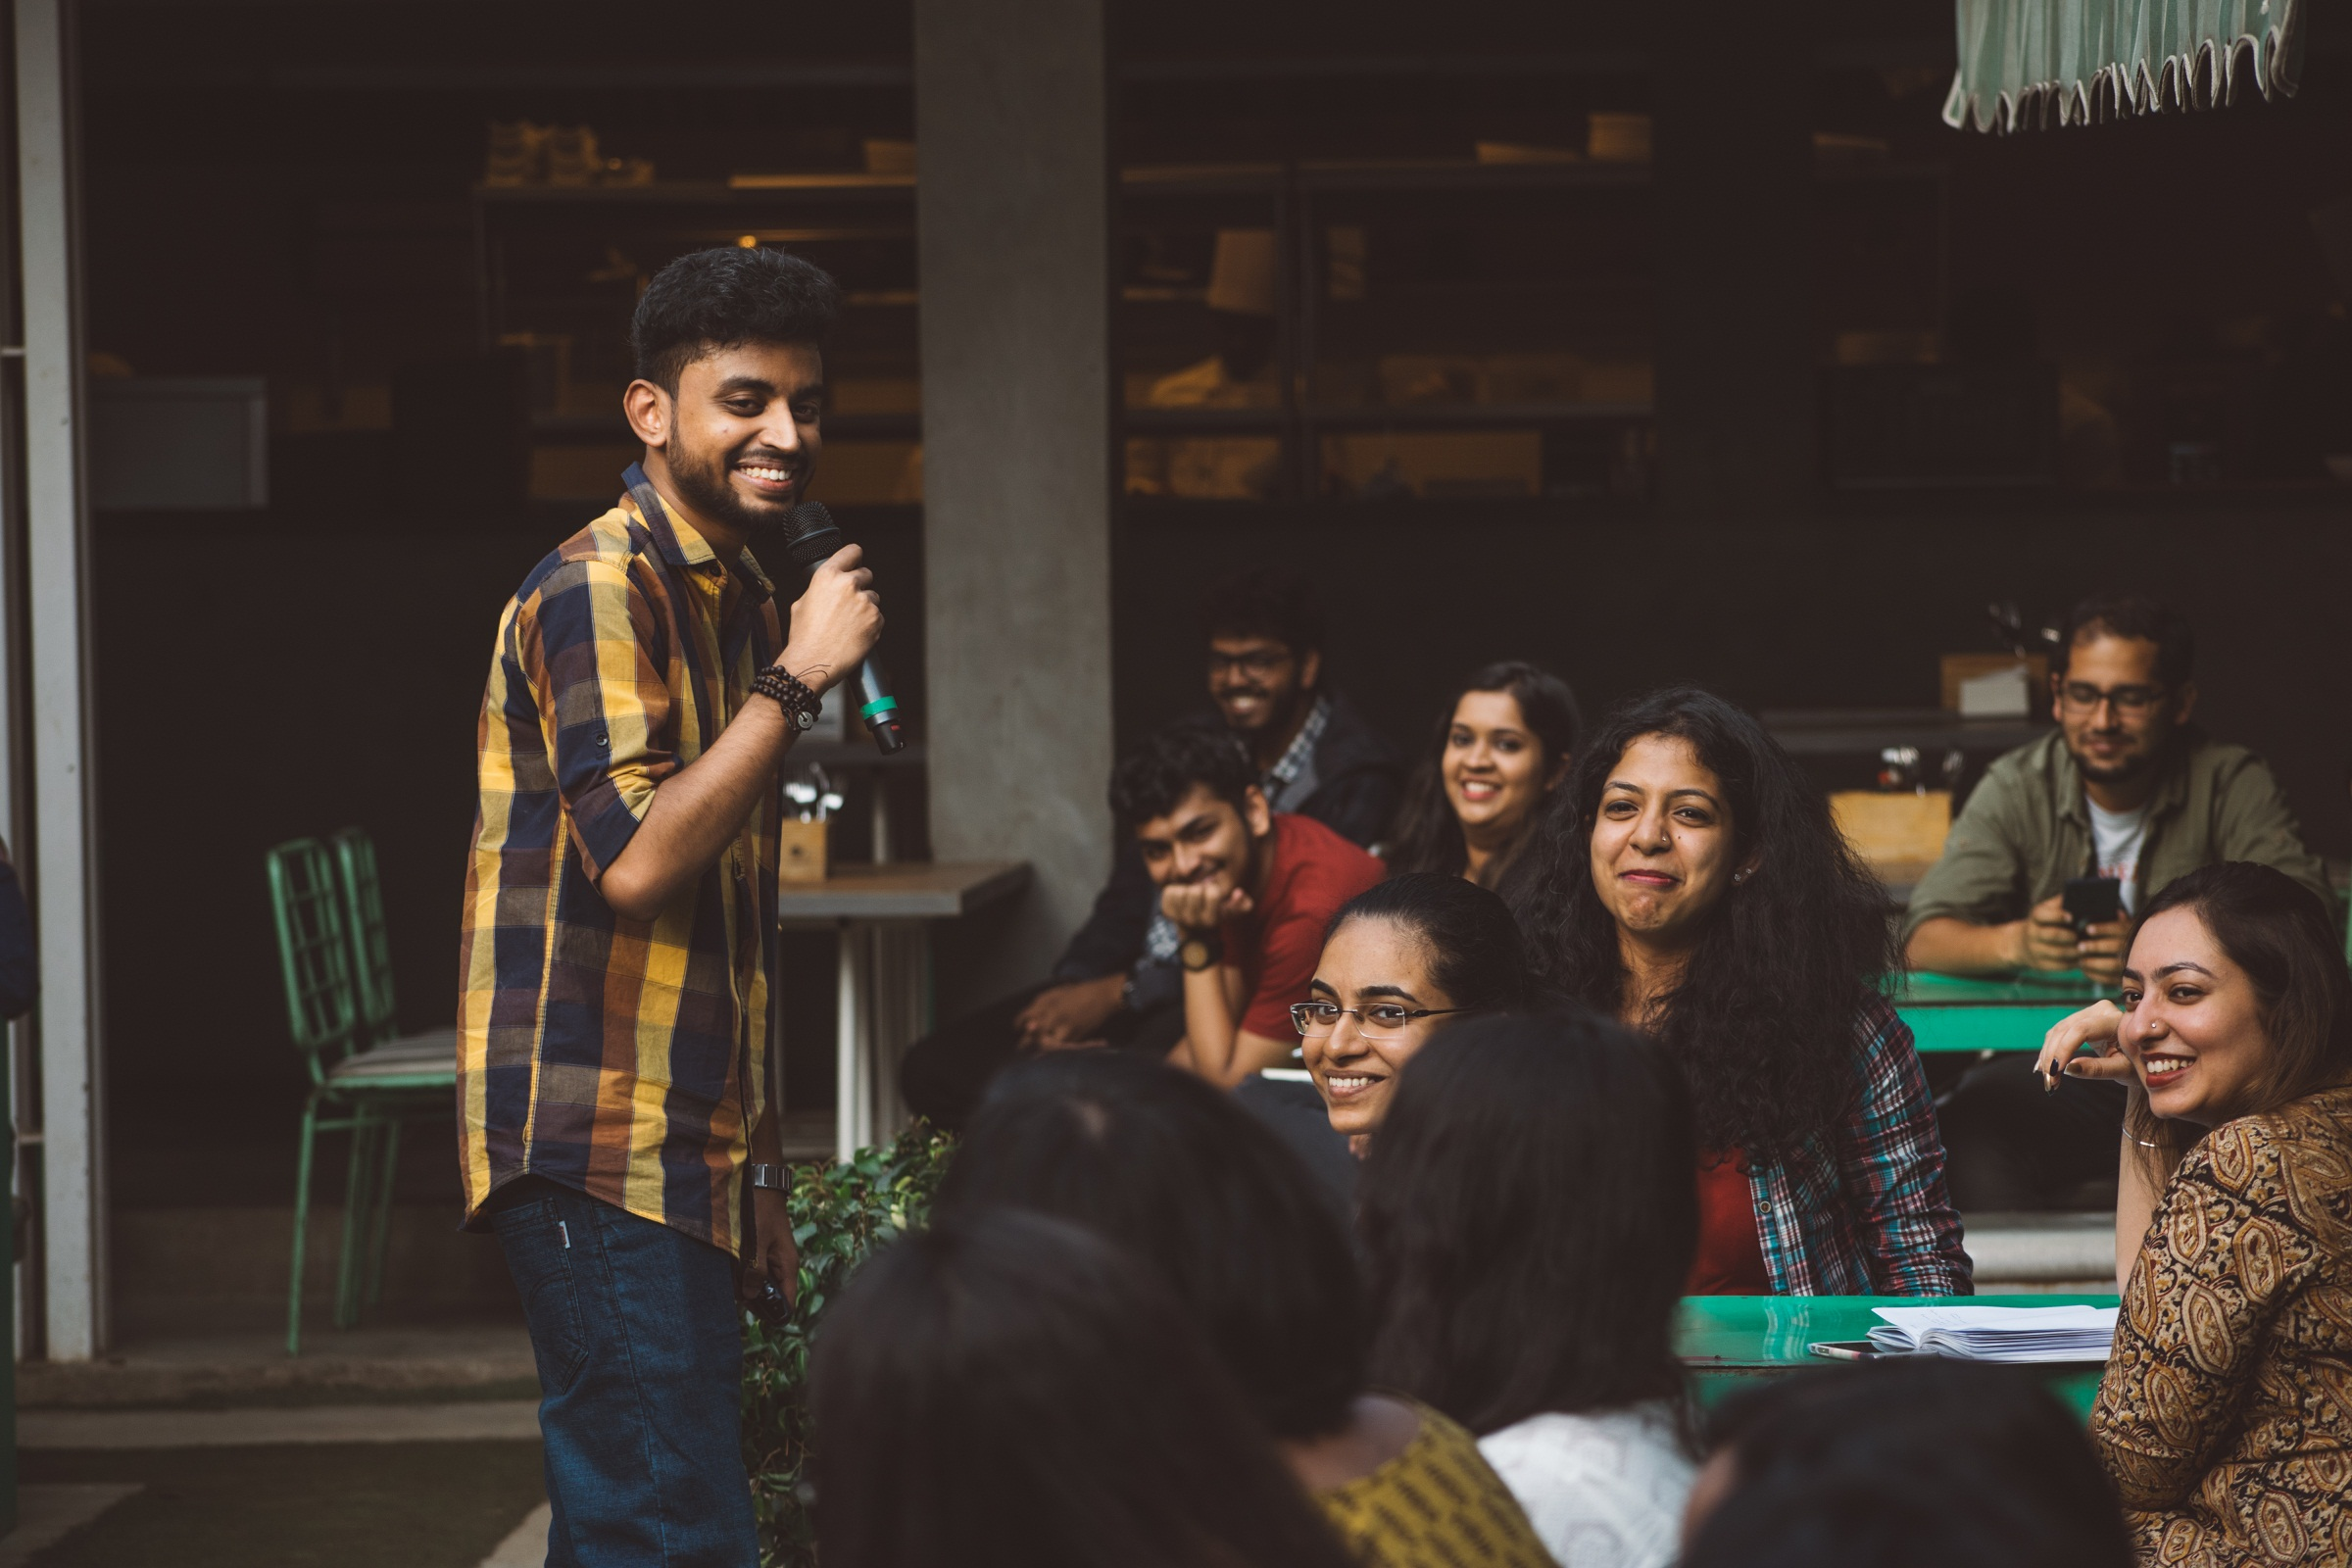 Joel Thottan, chief curator-app content TTT, at a workshop at Biergarten Brewery and Kitchen in Bengaluru.